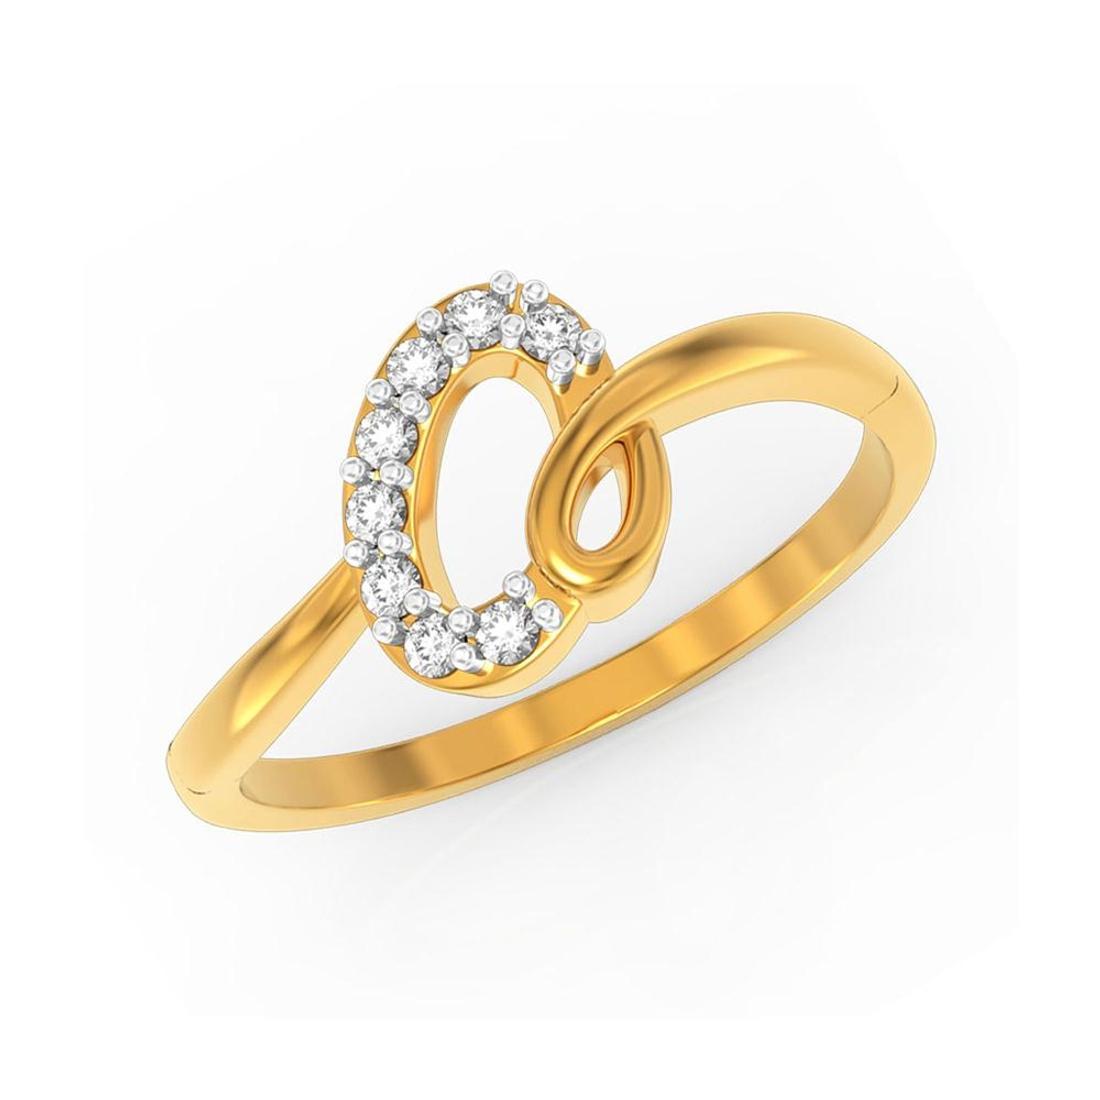 Buy Charu Jewels Diamond Ladies Ring CJLR0384 Online in India